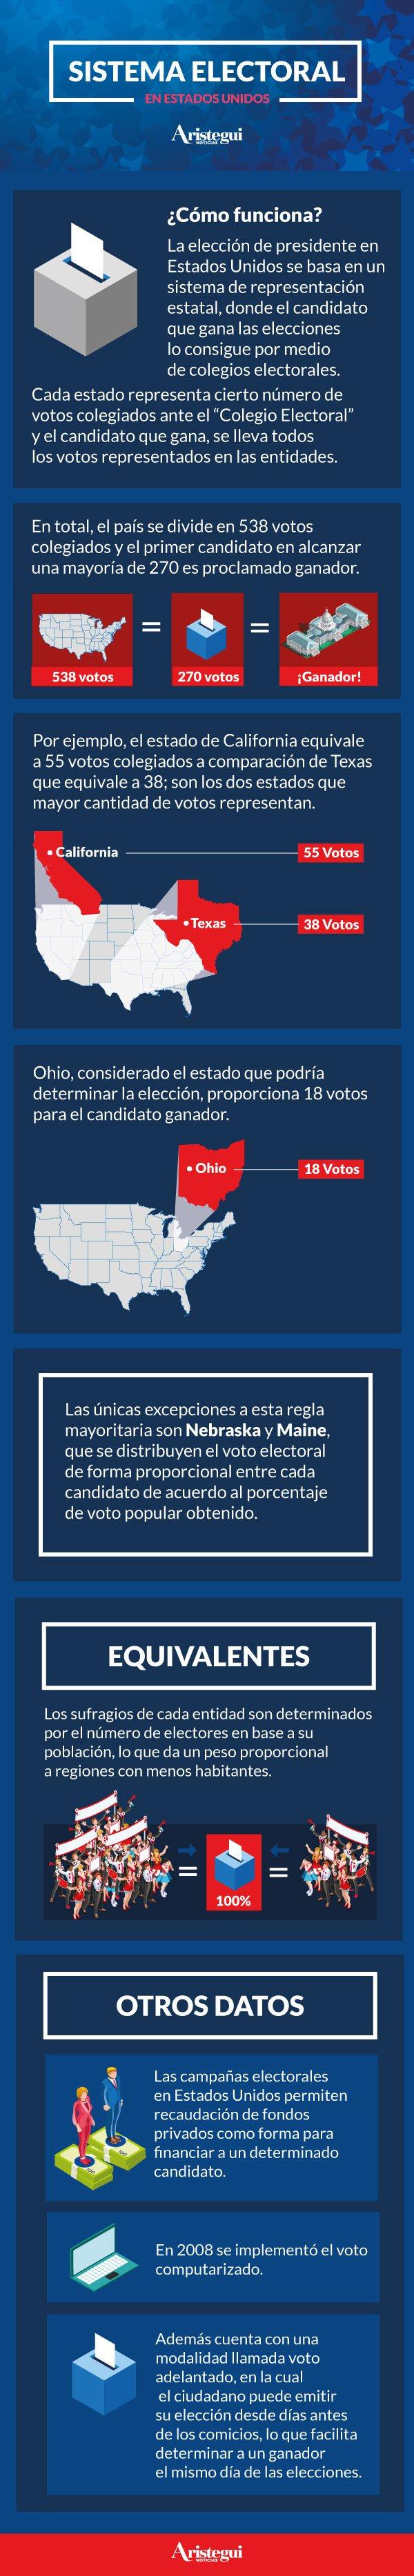 sistema-electoral-estados-unidos-infografia